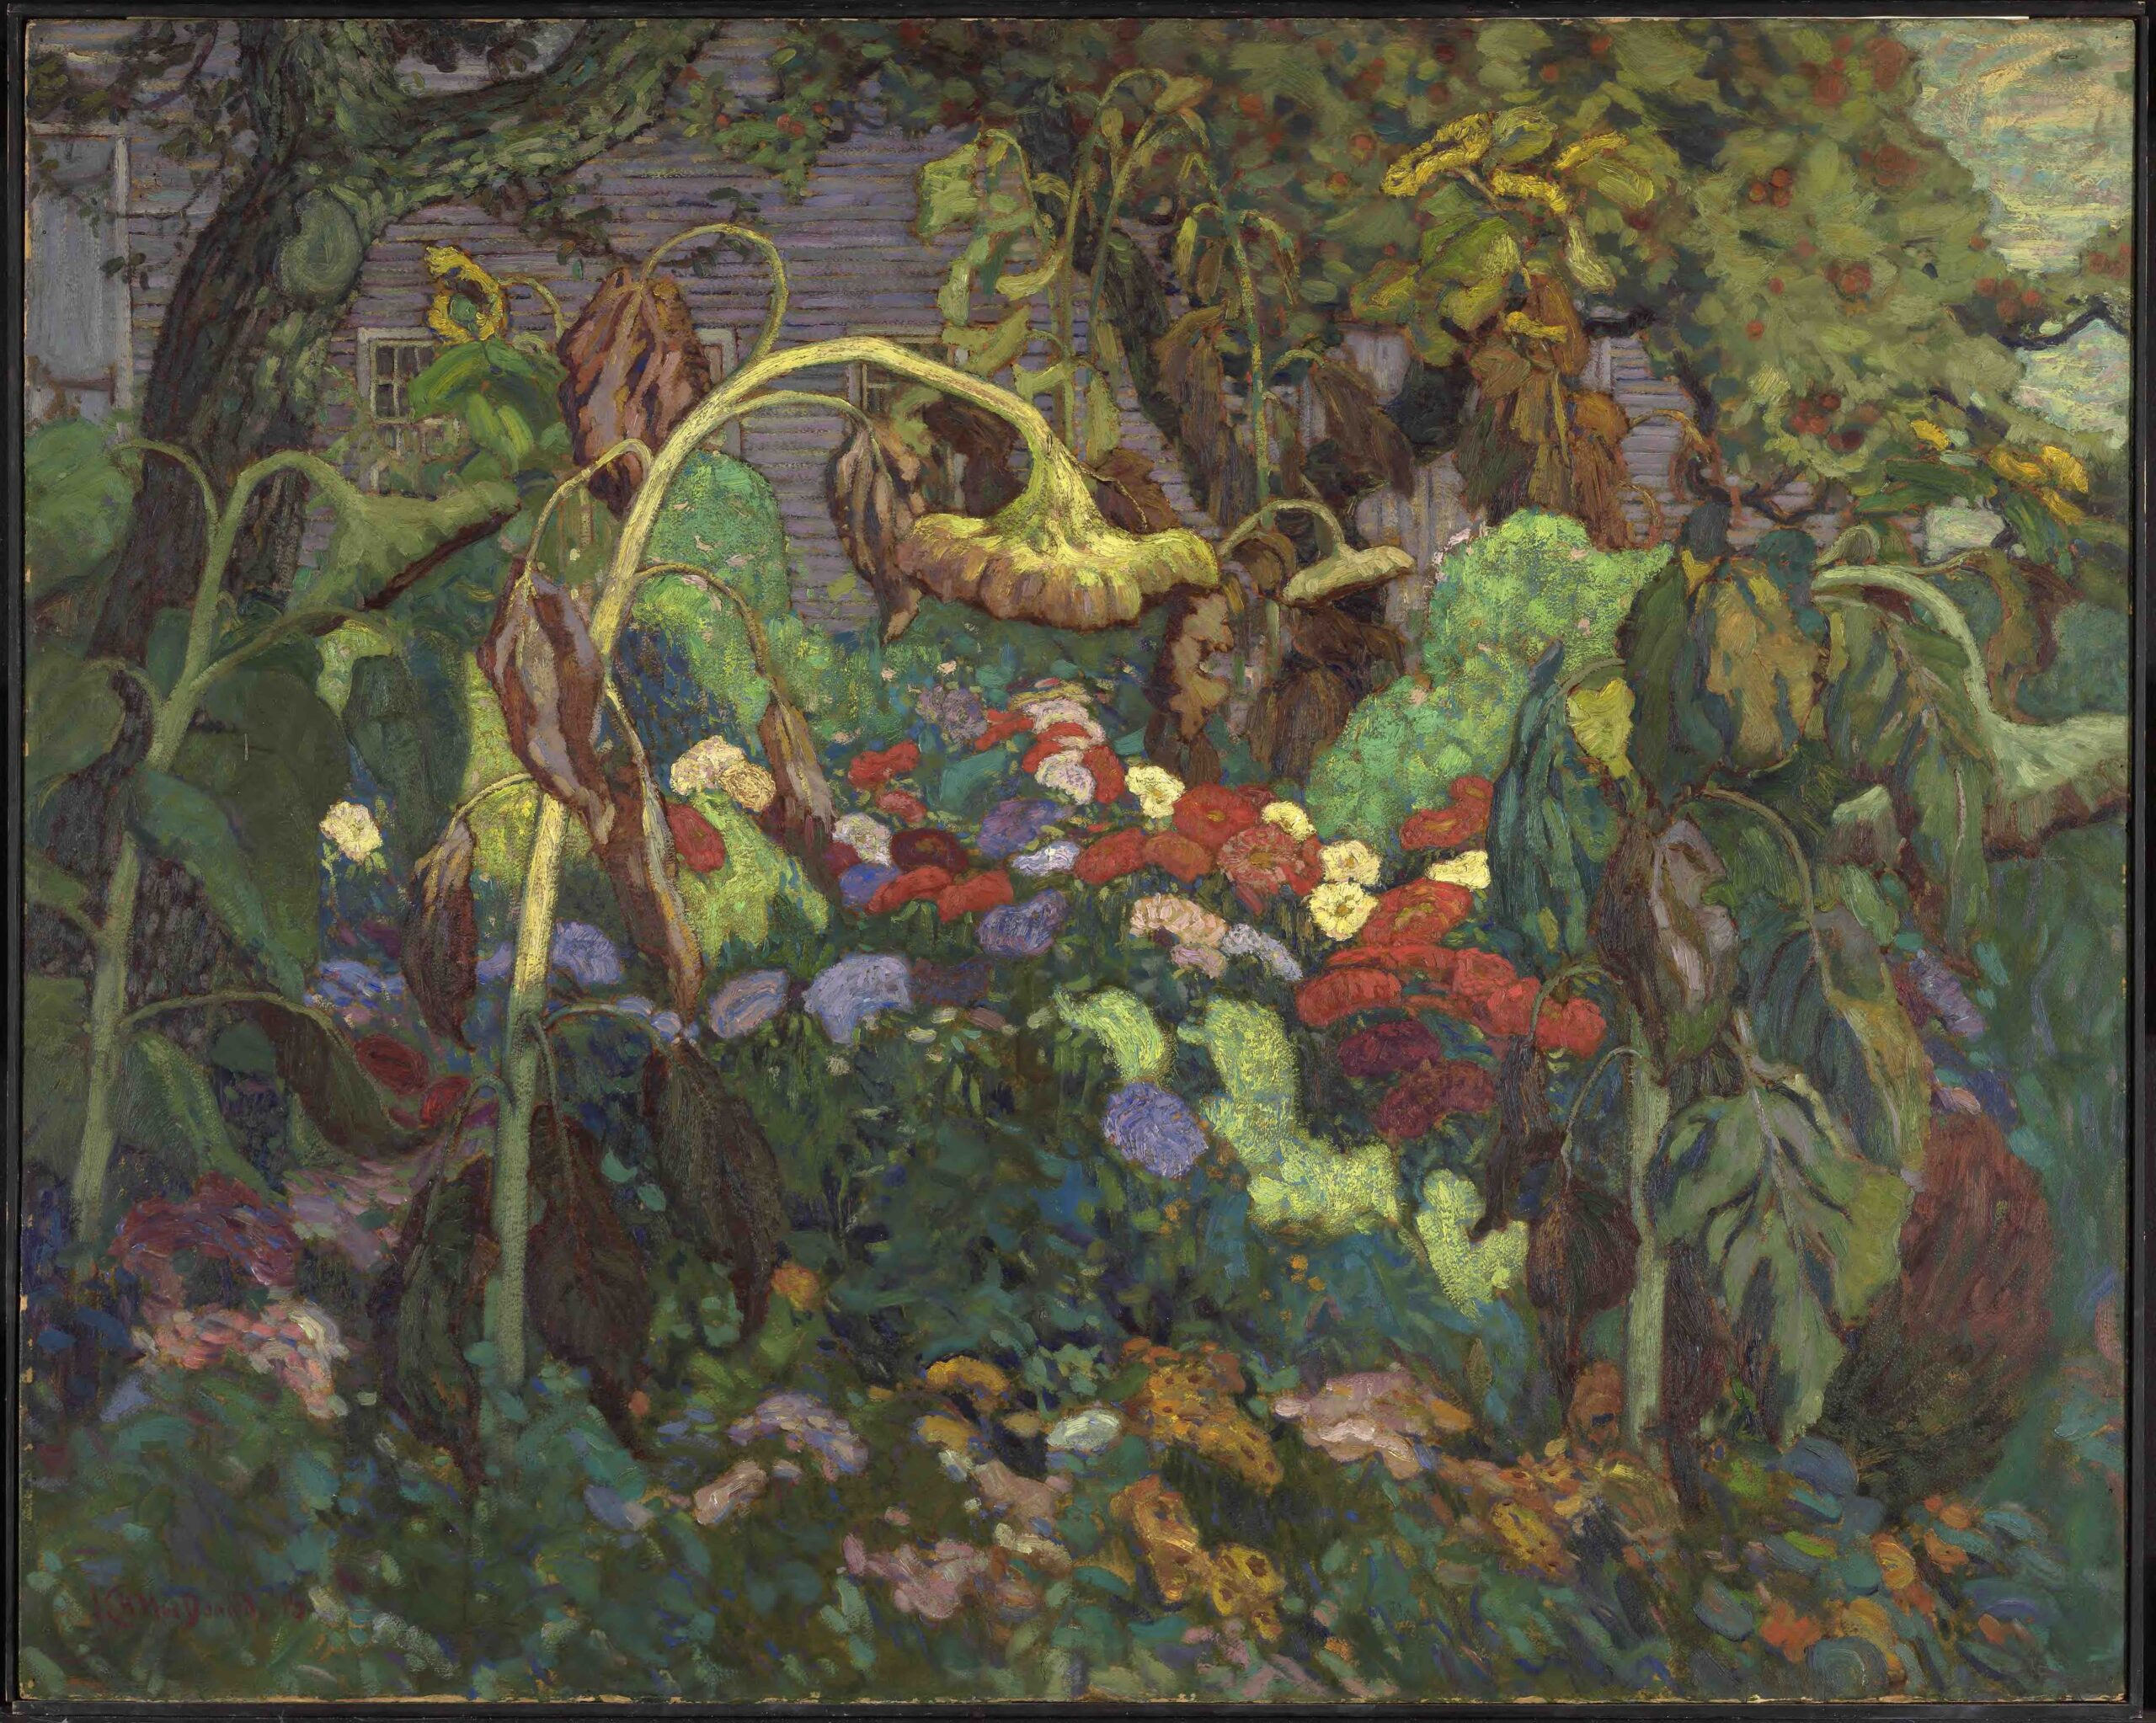 J.E.H. MacDonald's painting, The Tangled Garden, 1916